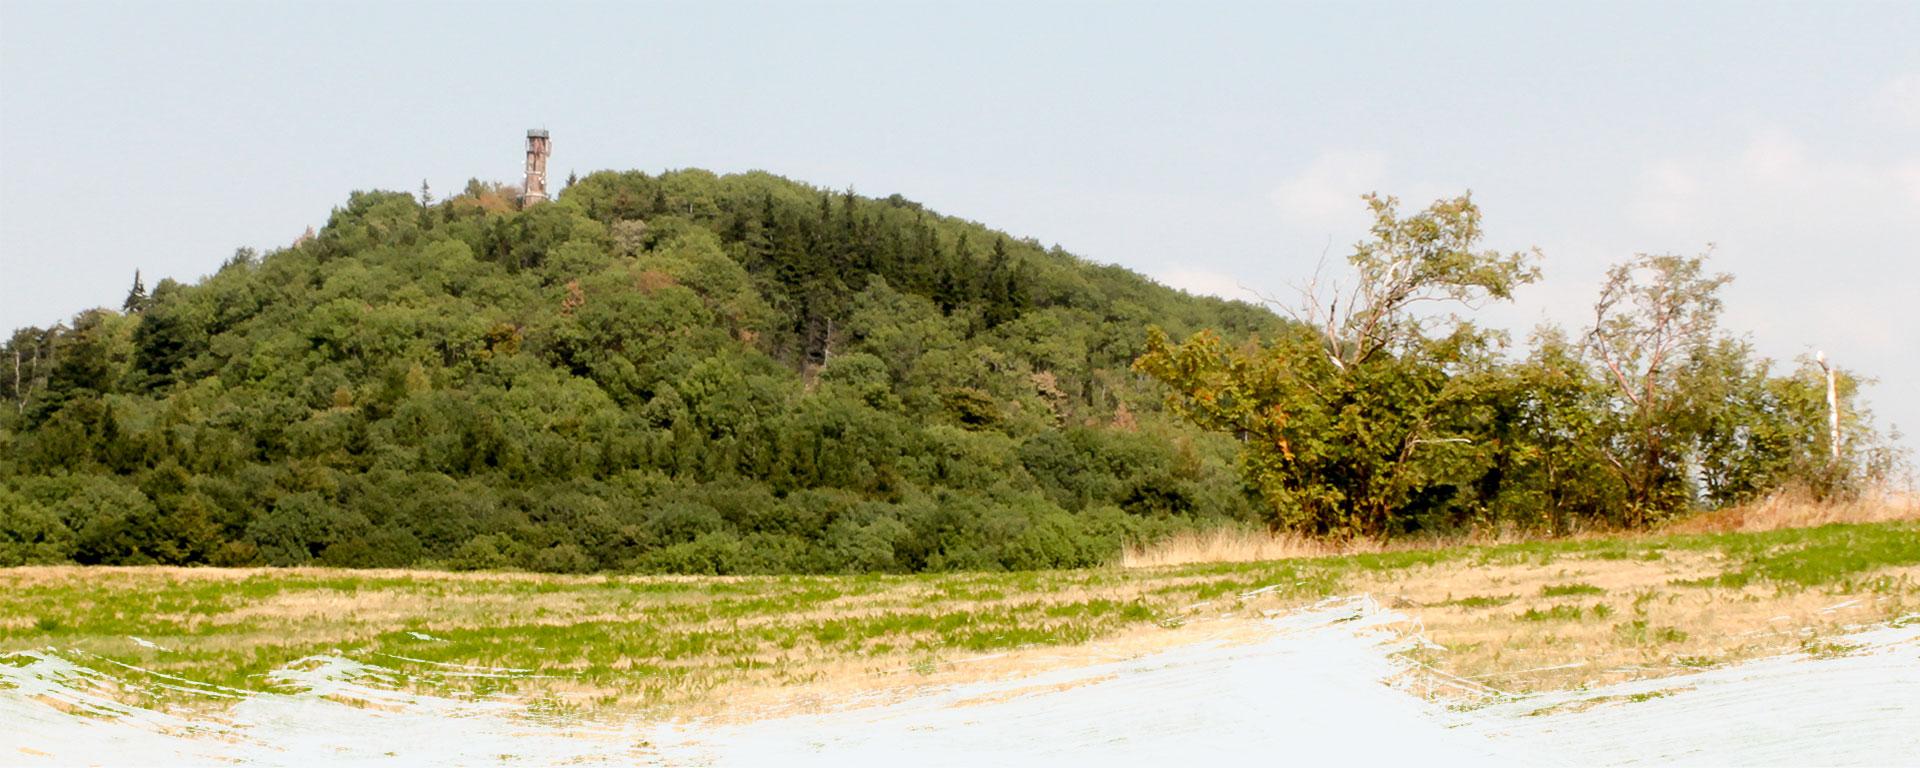 14-achttausender-etappe-geisingberg